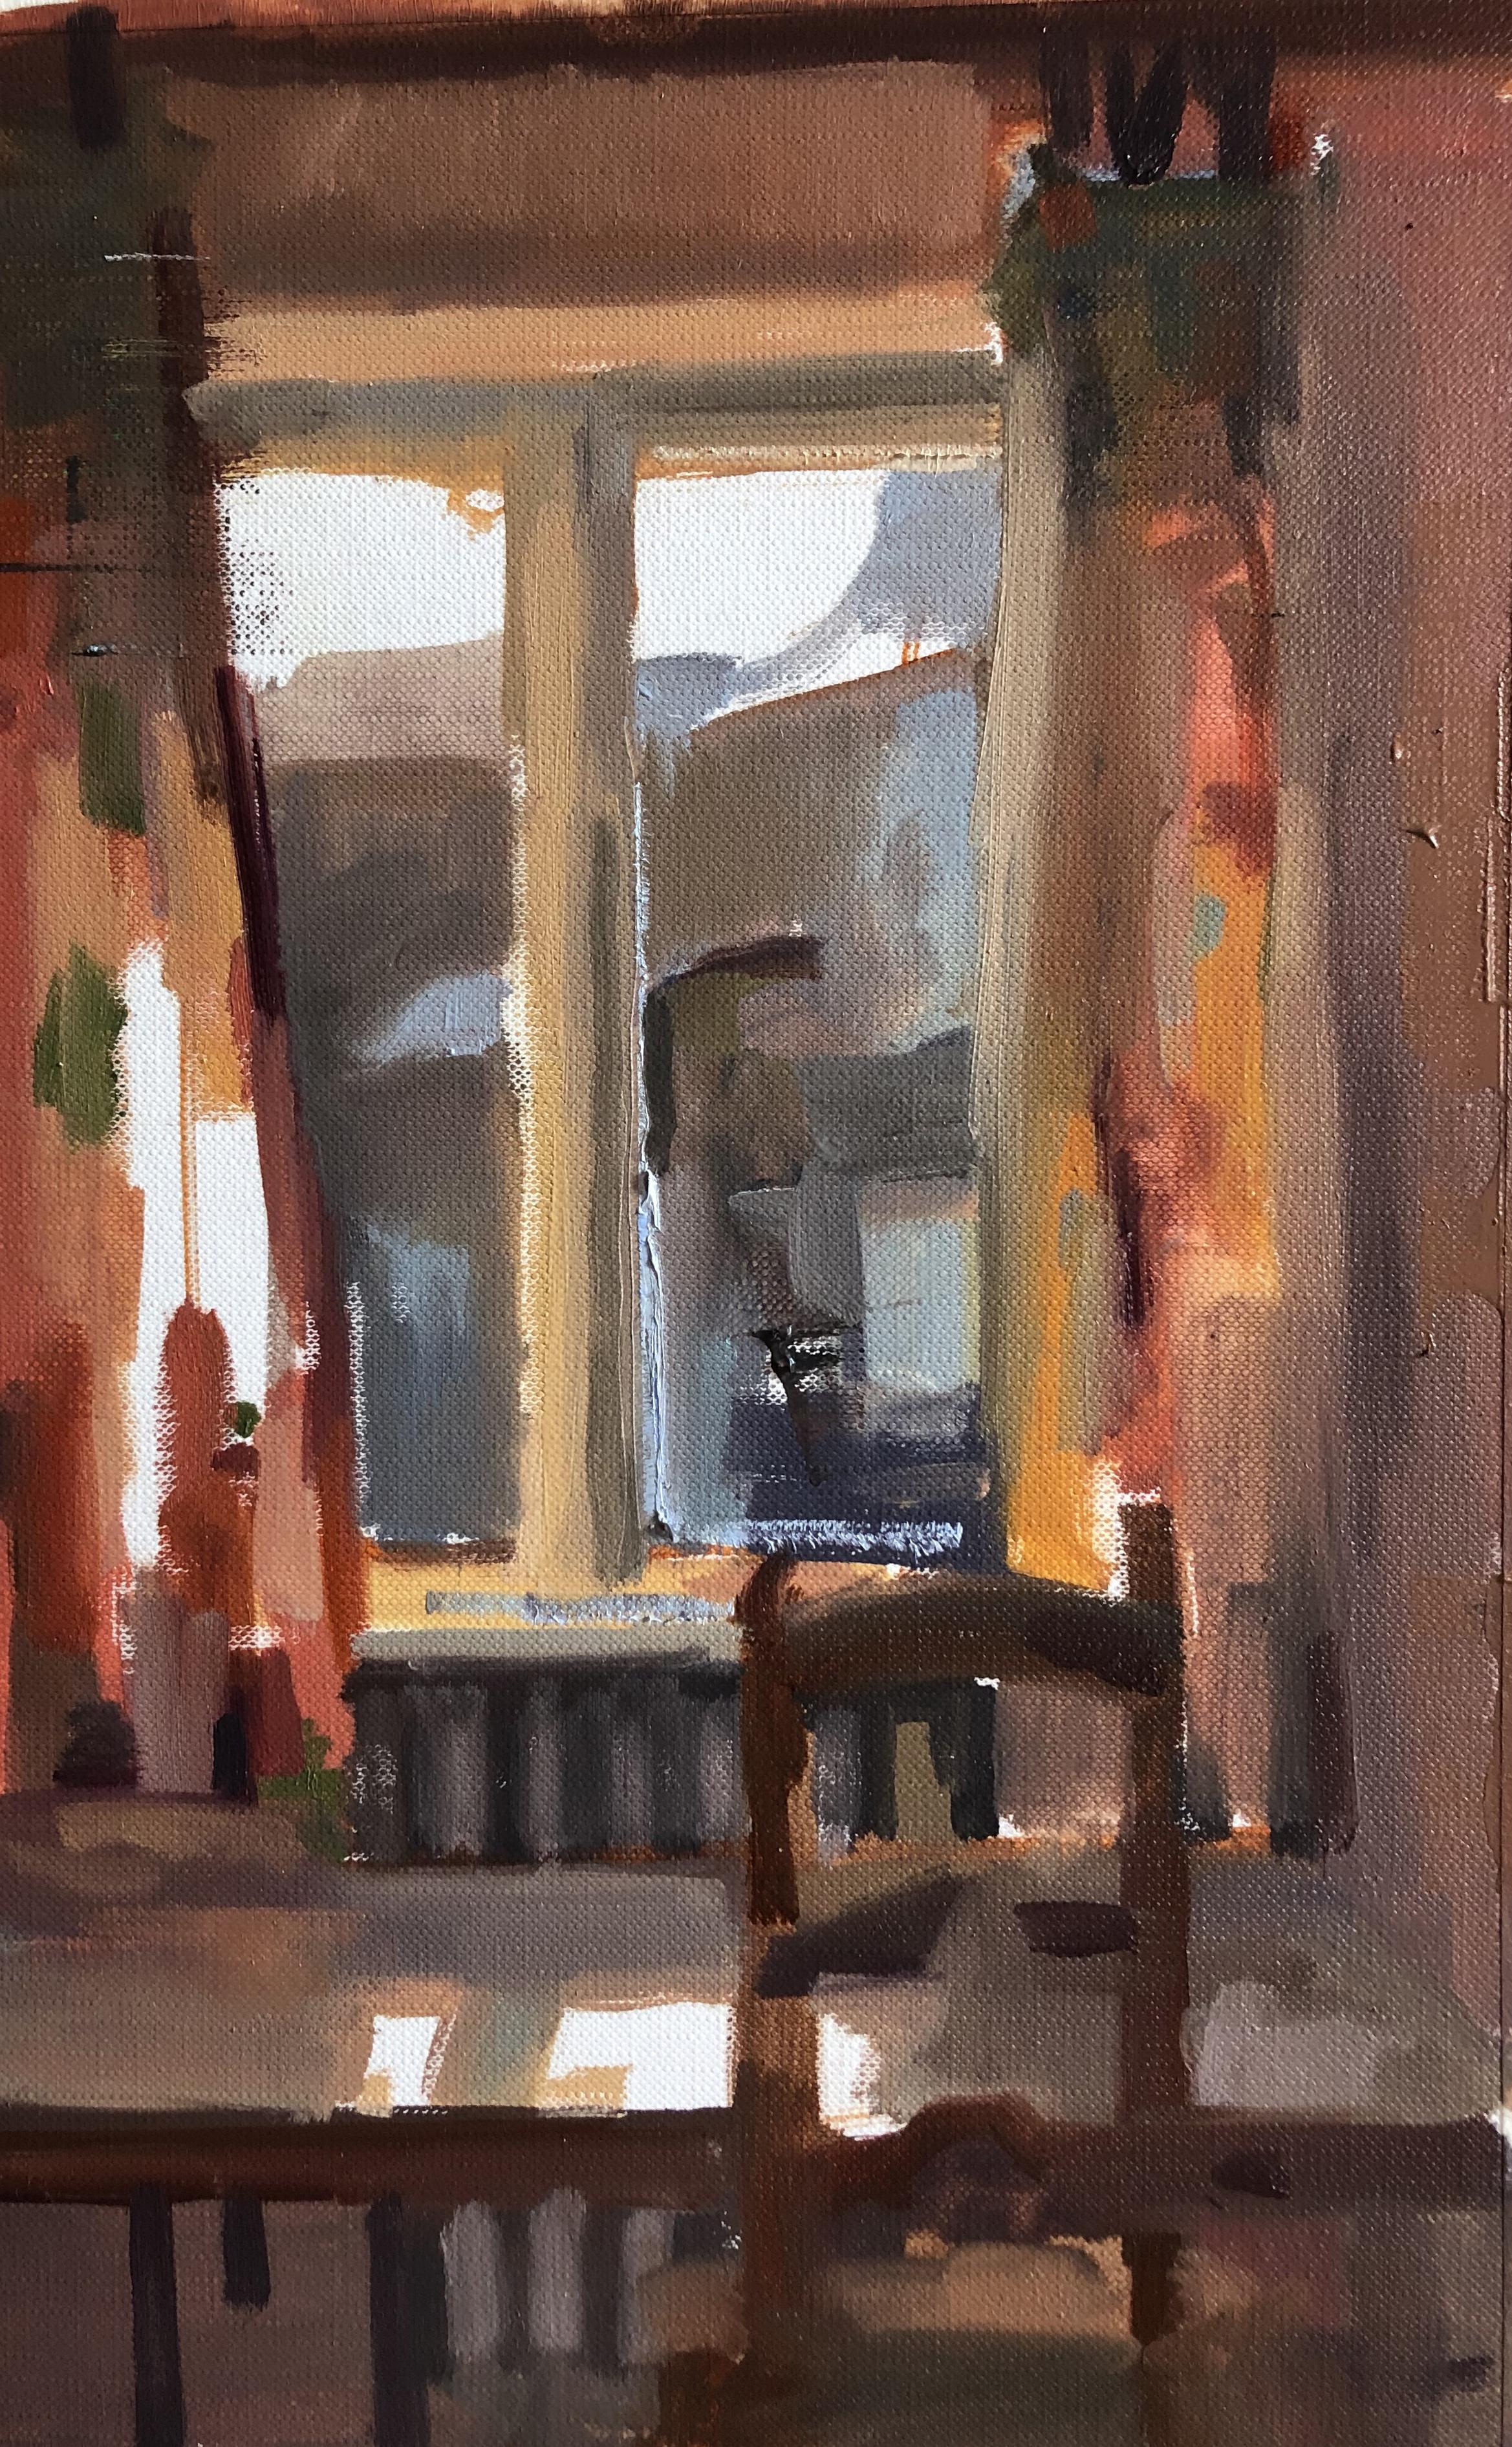 palazzo window 1.jpg